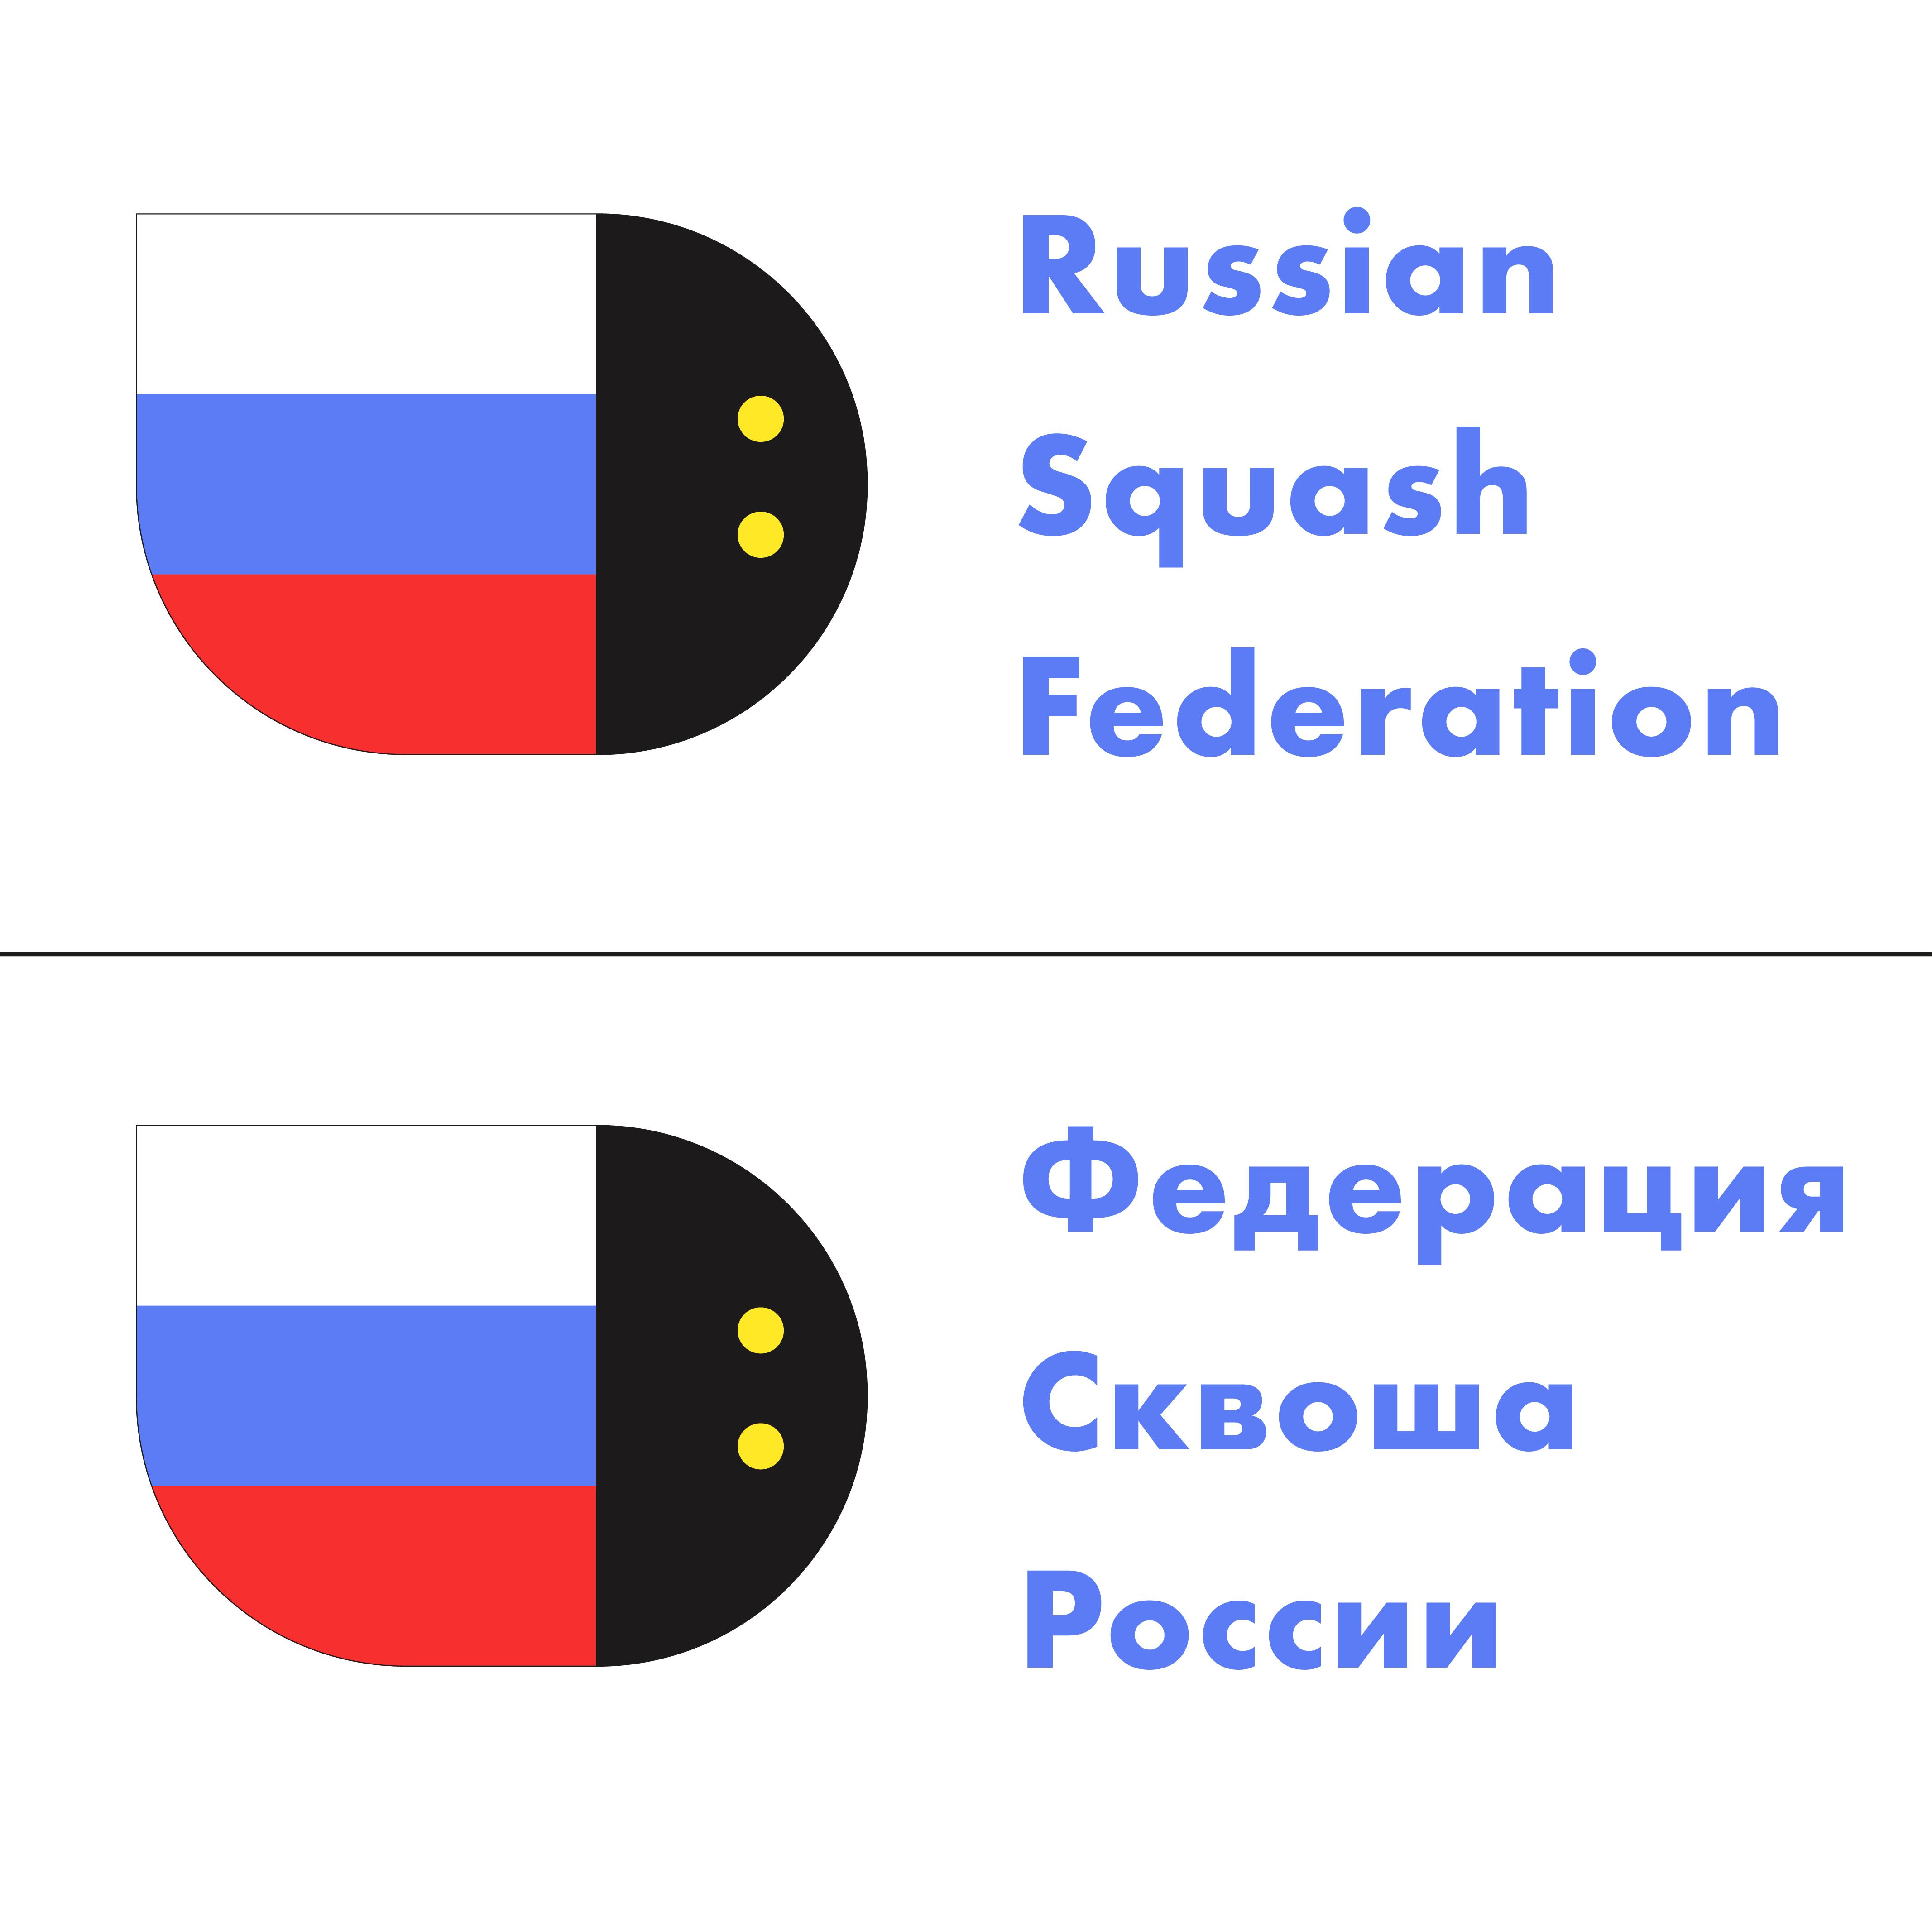 Разработать логотип для Федерации сквоша России фото f_3365f35f3405fe71.png